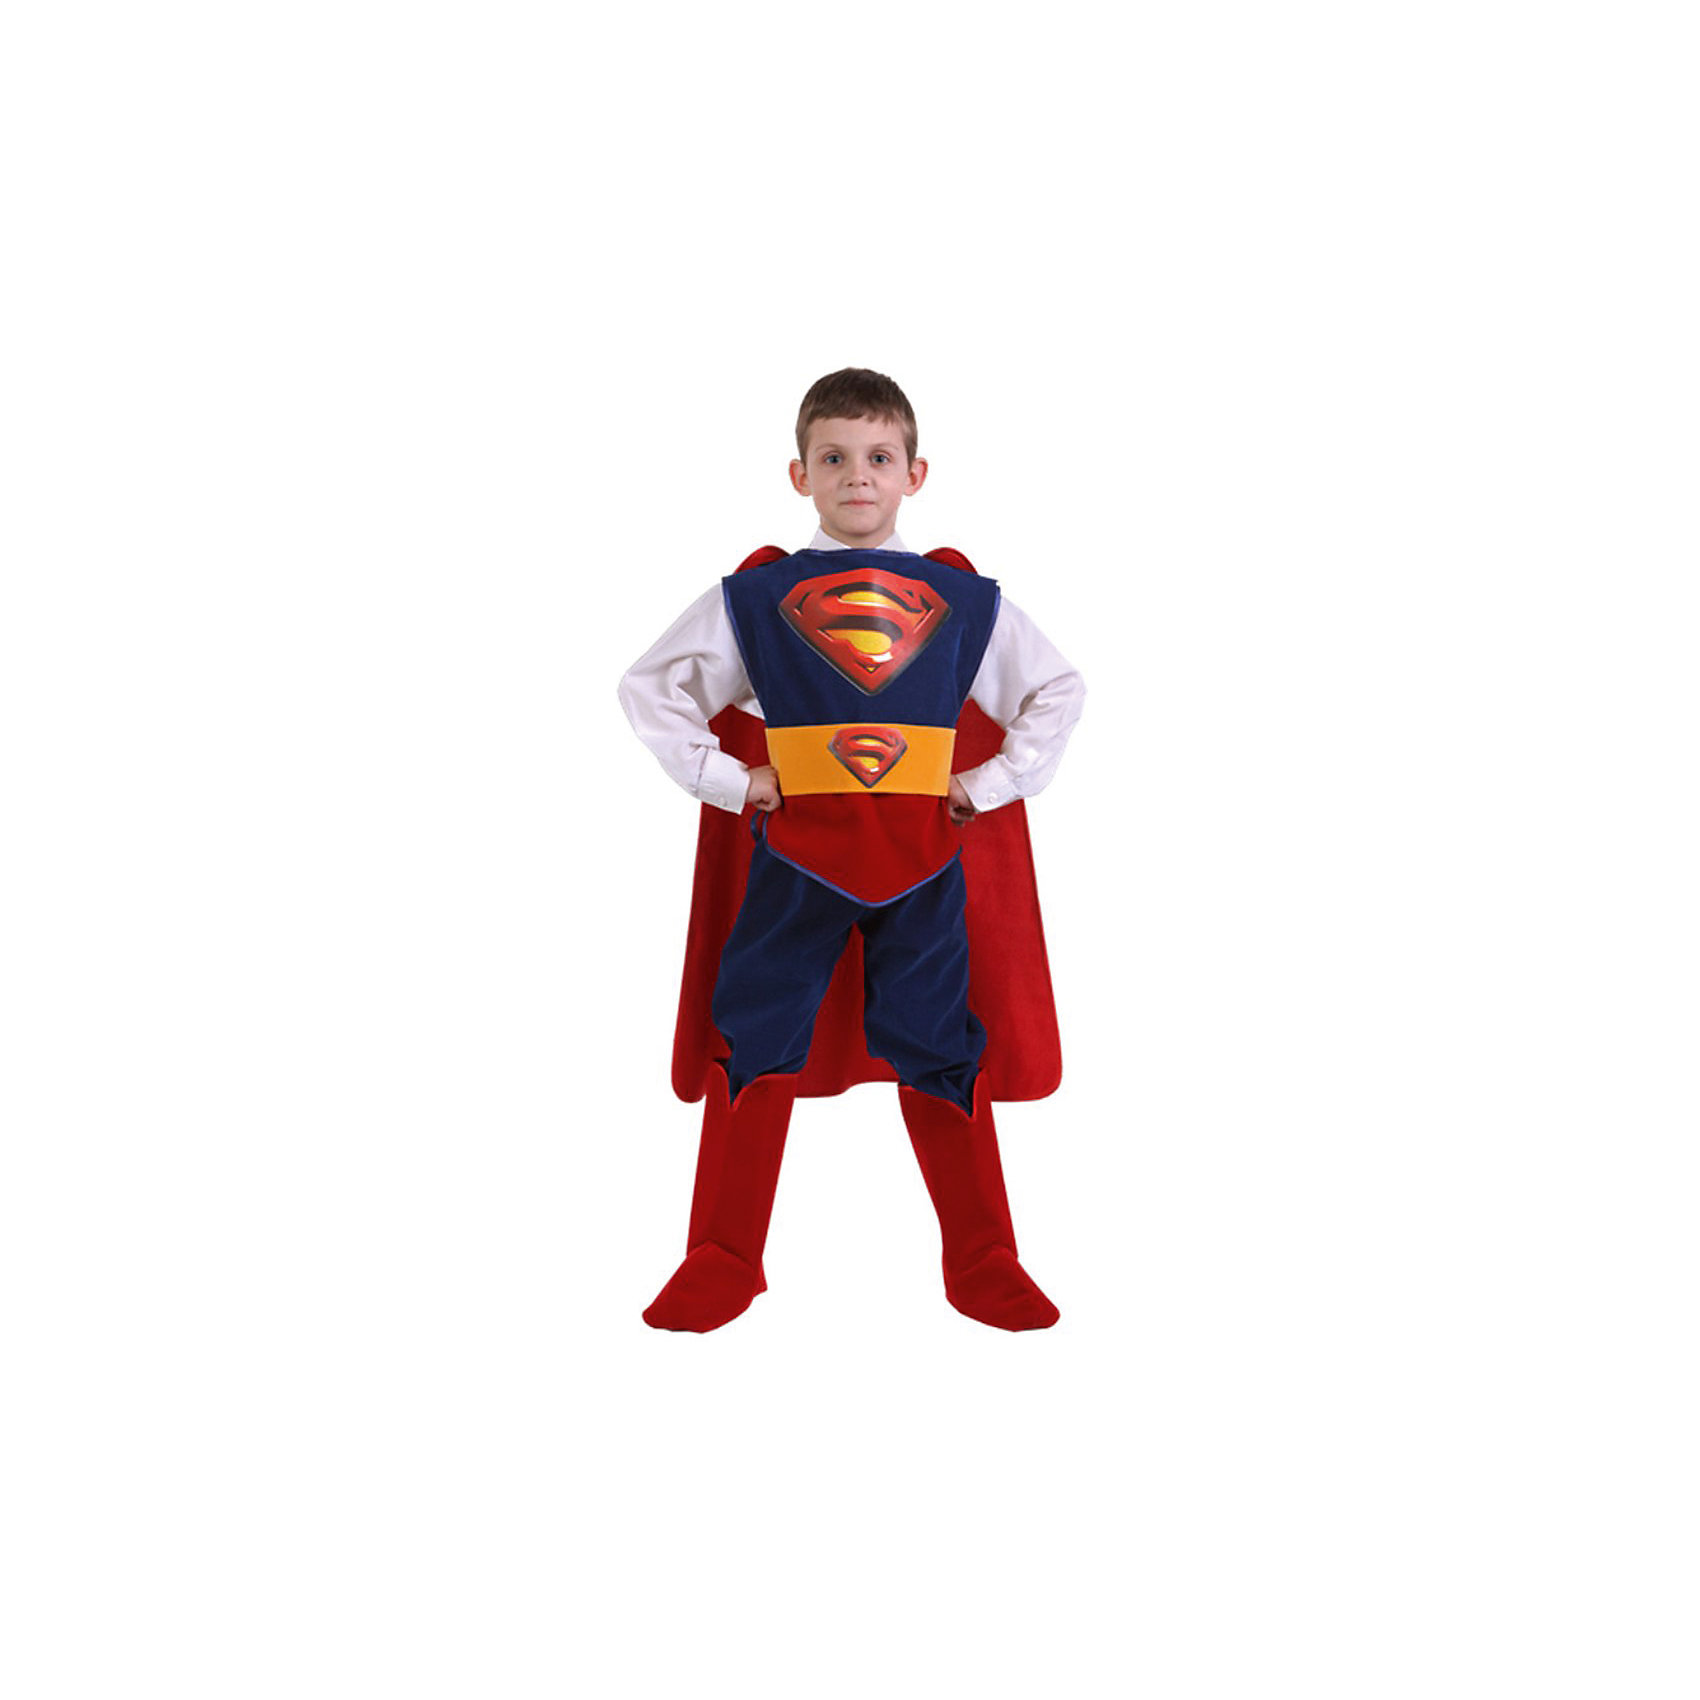 Батик Карнавальный костюм Супермен (Звездный маскарад), Батик купить часы мальчику 7 лет